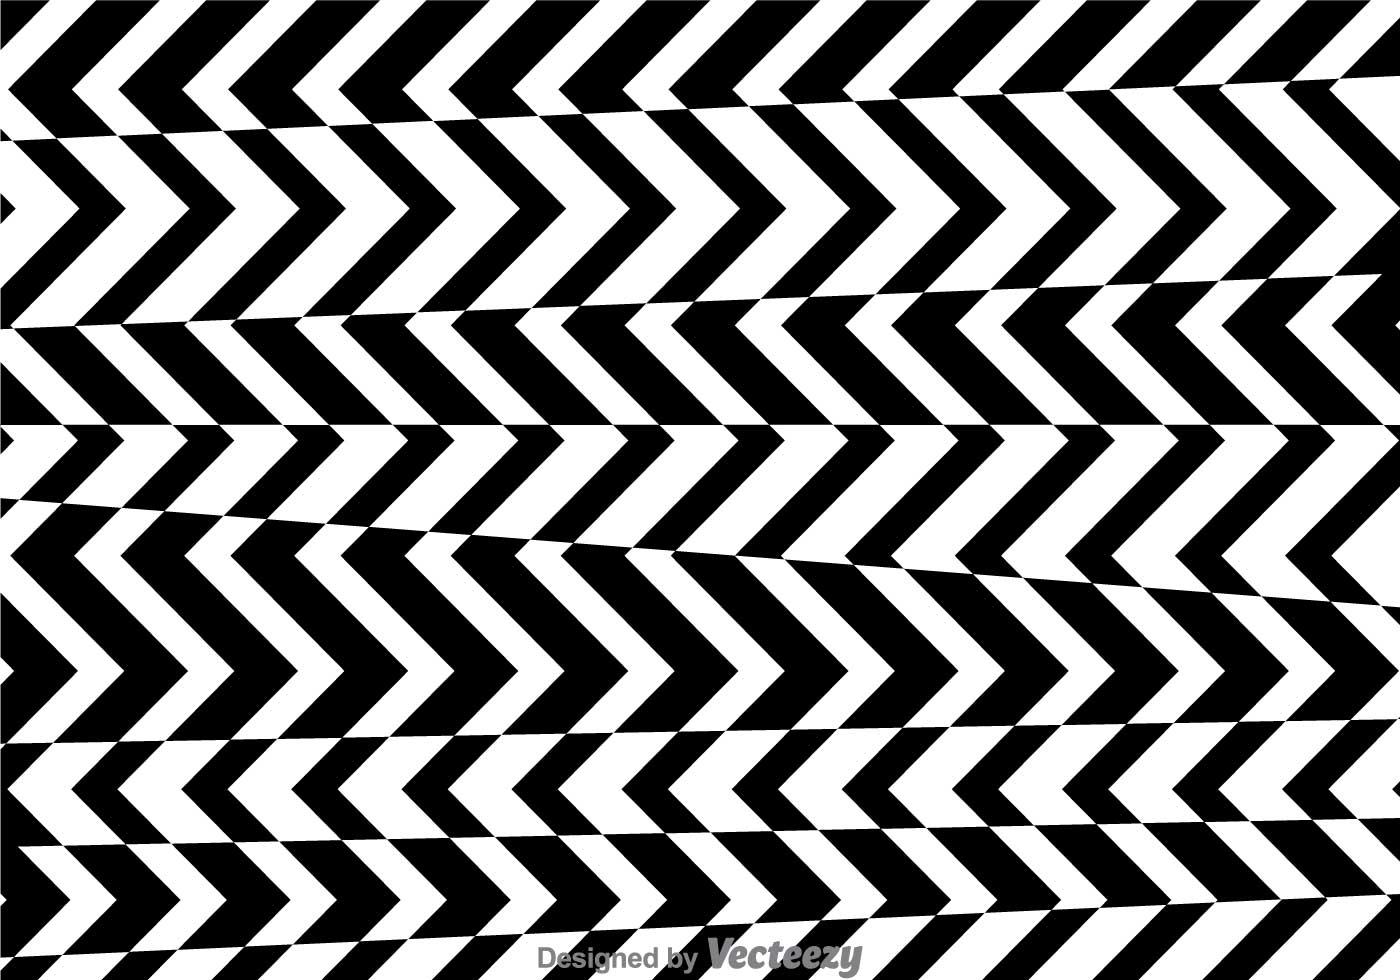 Calm Stripe Black Patterns Names Black Pattern Download Free Vector Stock Black Patterns Easy To Draw Pattern Download Free Vector Stock Graphics Stripe Black houzz-02 Black And White Patterns